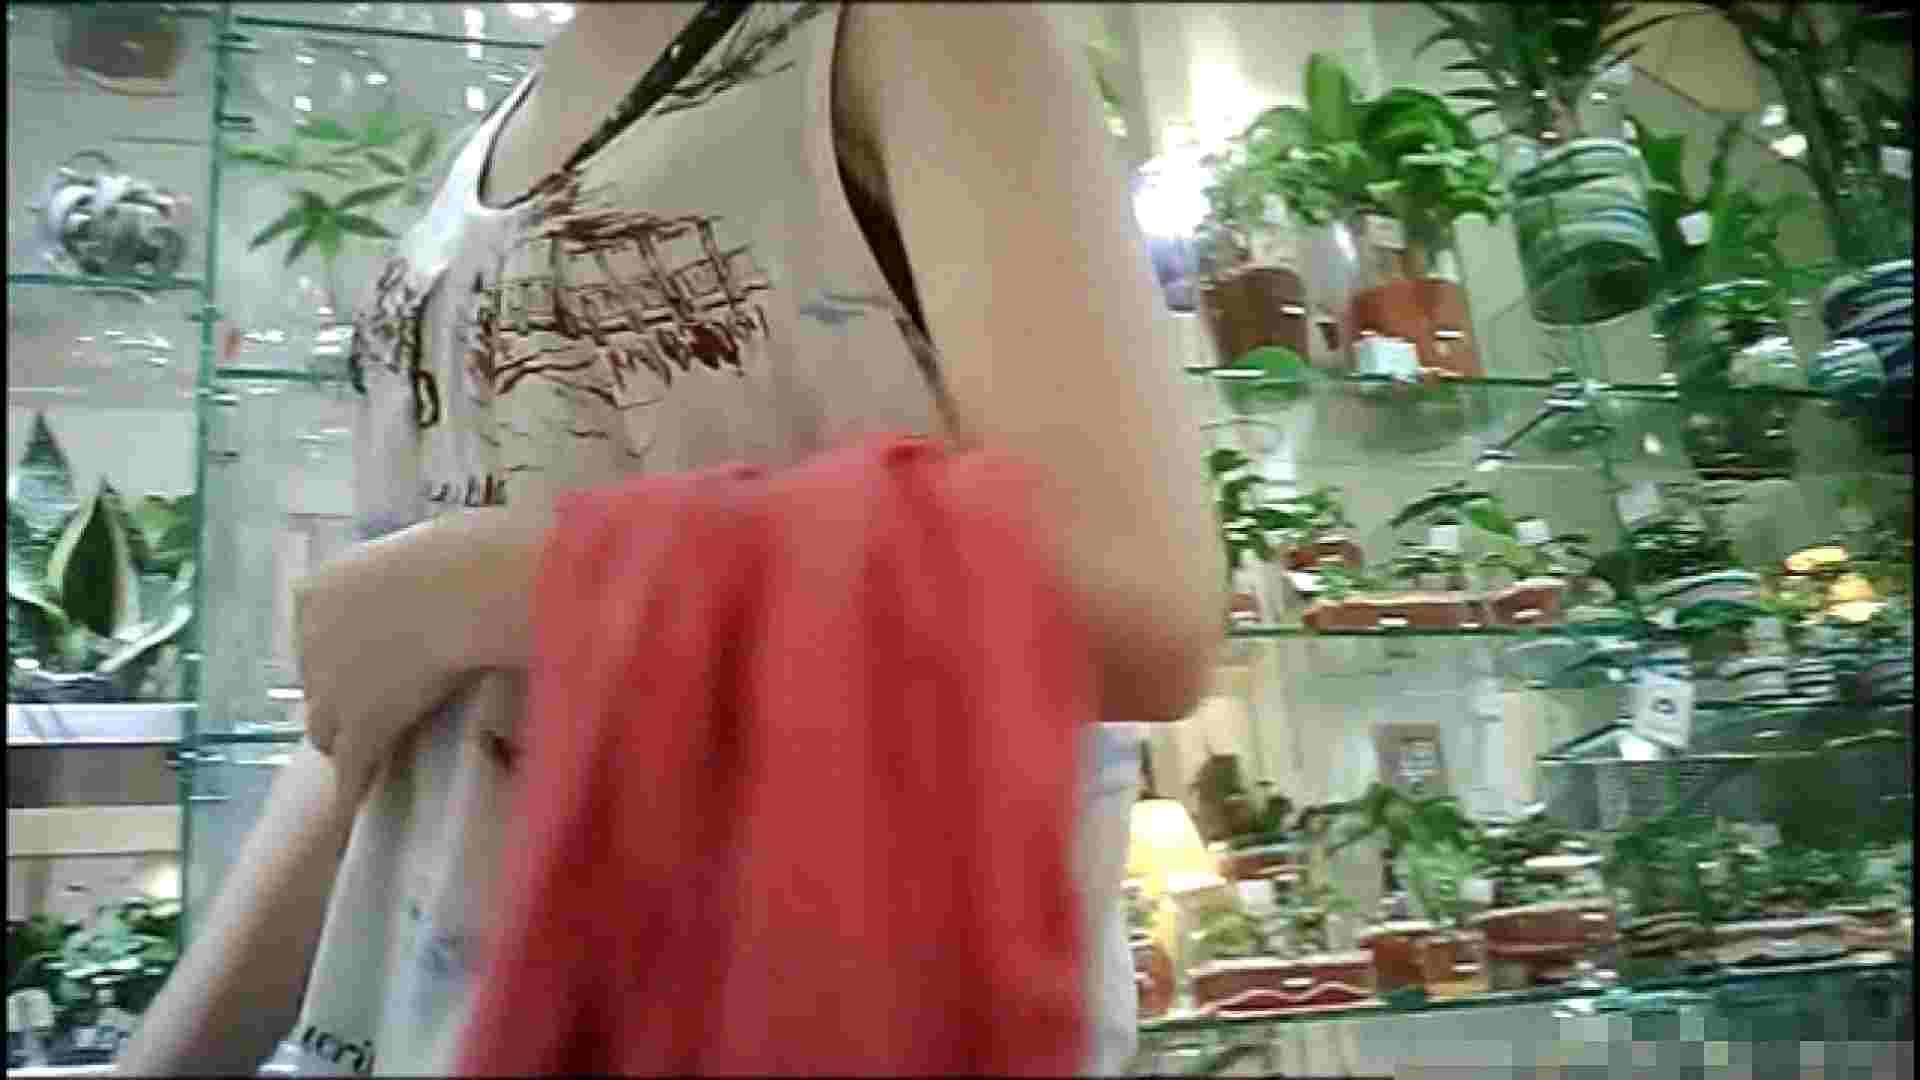 NO.1 普段から胸元がゆるい友達【某ファッションビル内の雑貨屋】 ギャル  64PIX 23